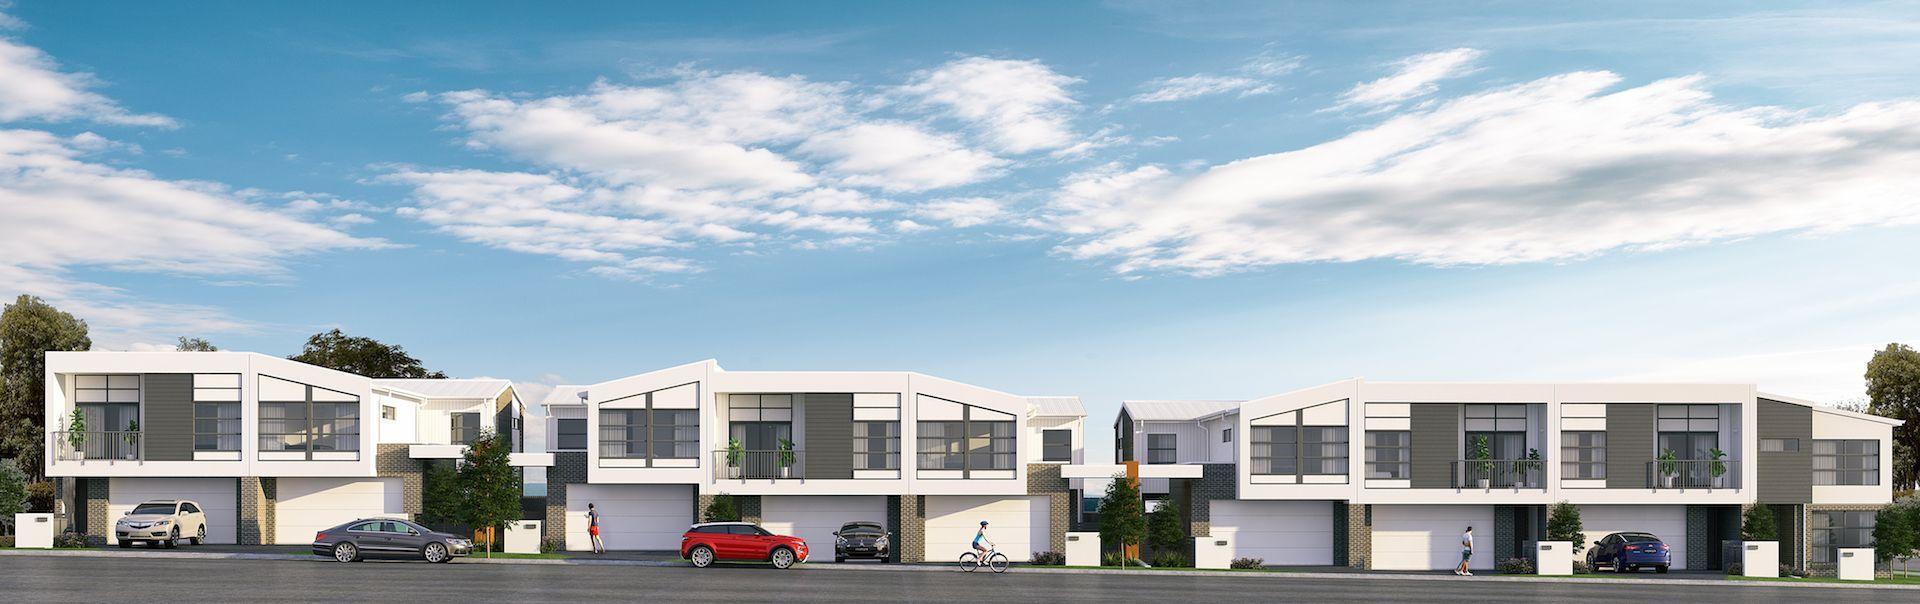 Lot 835 Cardew, Mango Hill QLD 4509, Image 2